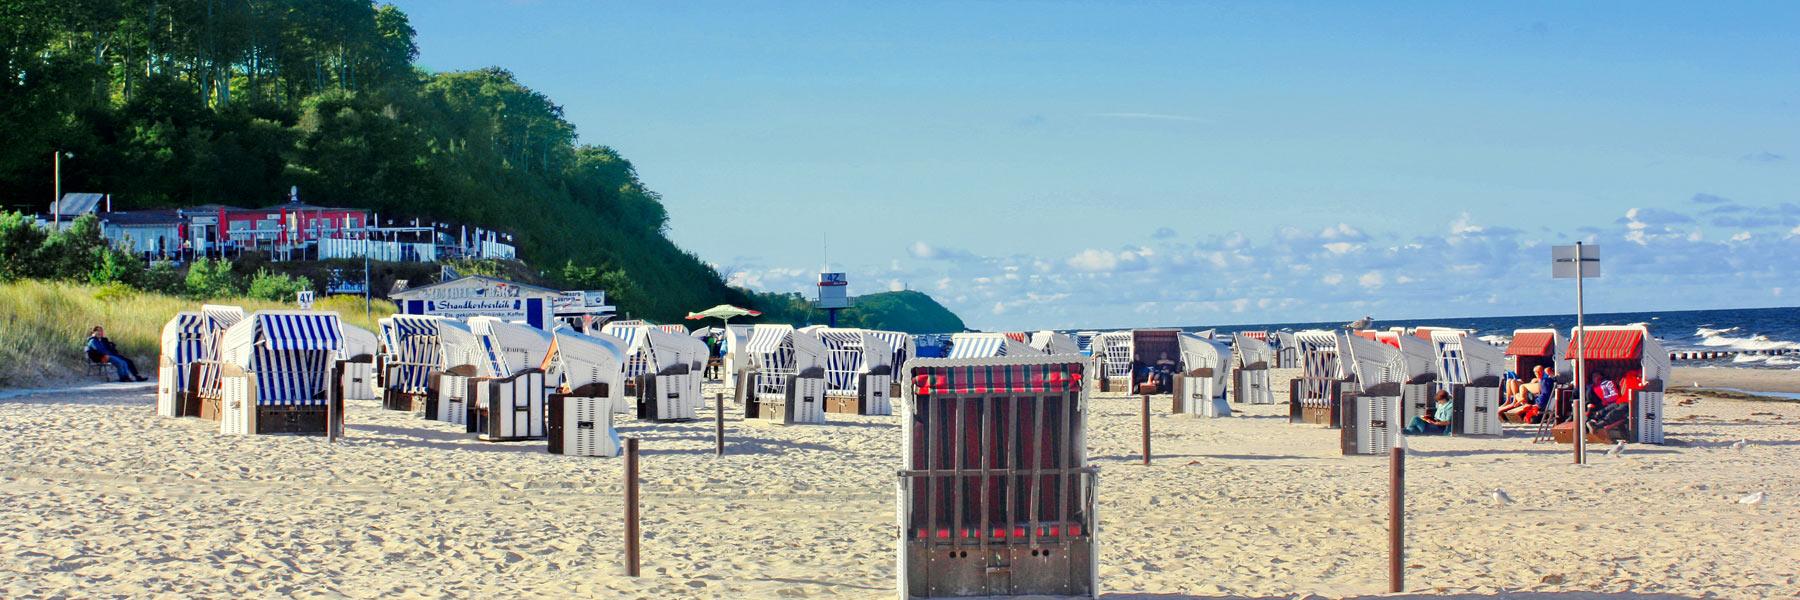 Strand Ückeritz - Insel Usedom